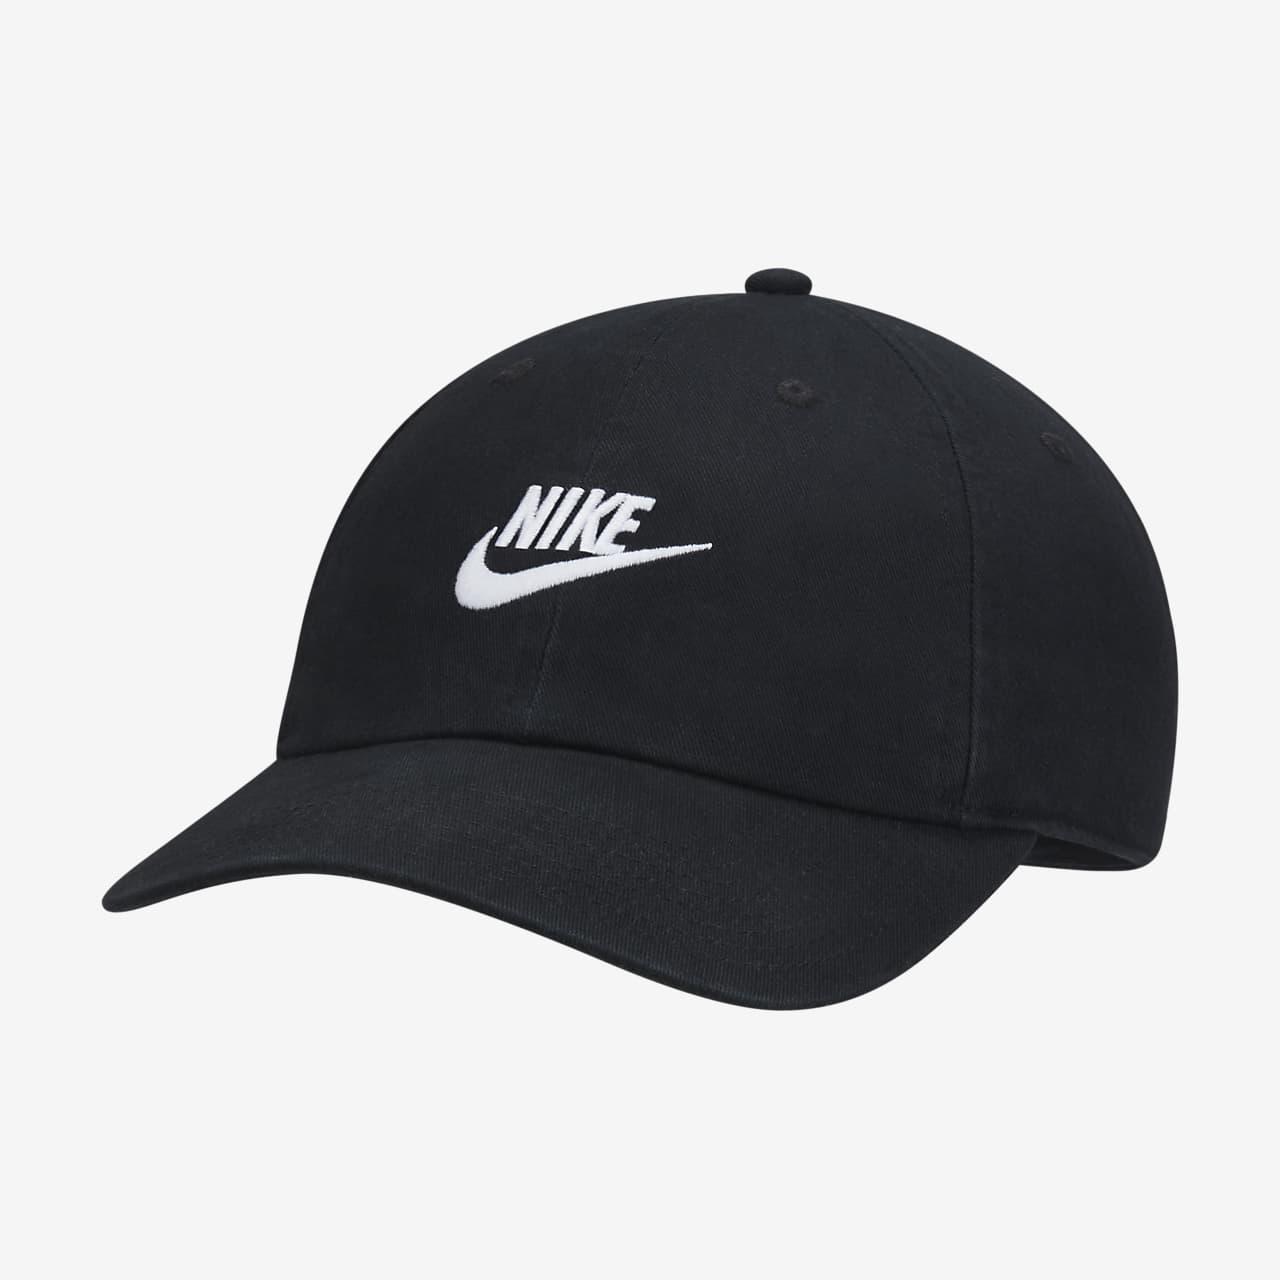 803119552f6b6 Nike Sportswear Heritage86 Futura Washed Hat. Nike.com MY